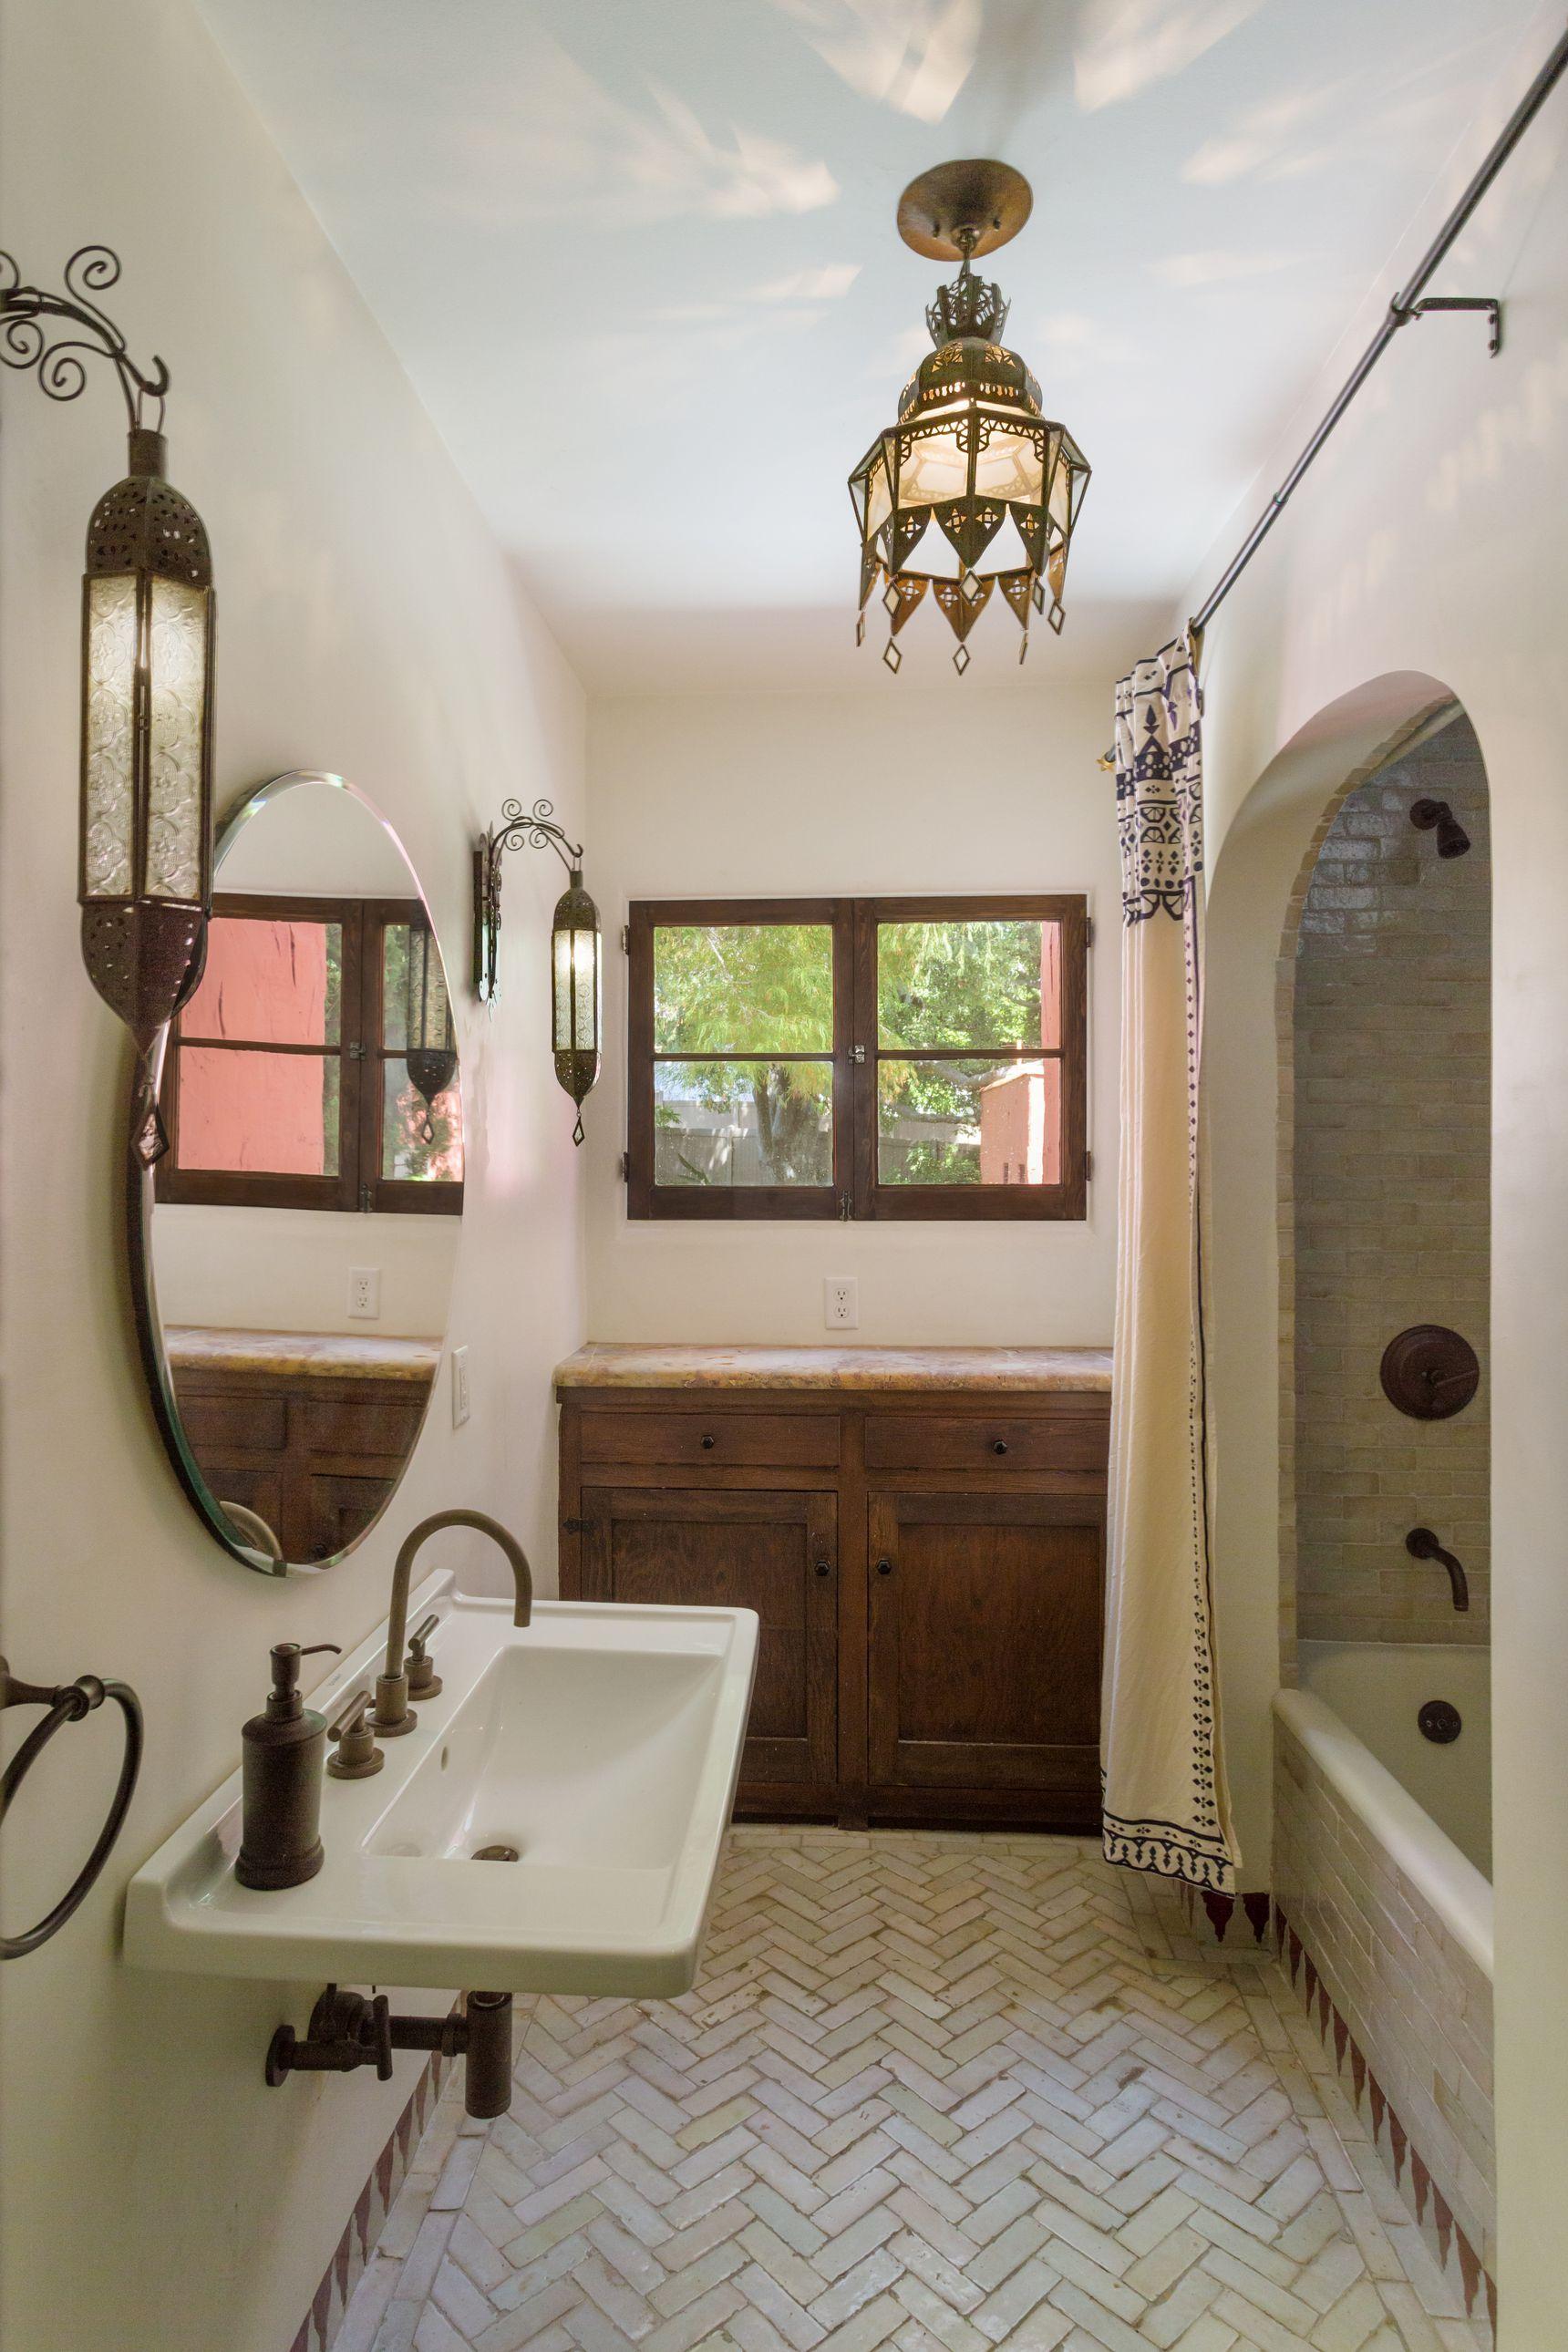 Stoneimpressions On Instagram A Sleek Modern Master Bath With A Touch Of Spanish Style Pattern Bathroom Interior Design Modern Master Bath Bathroom Interior